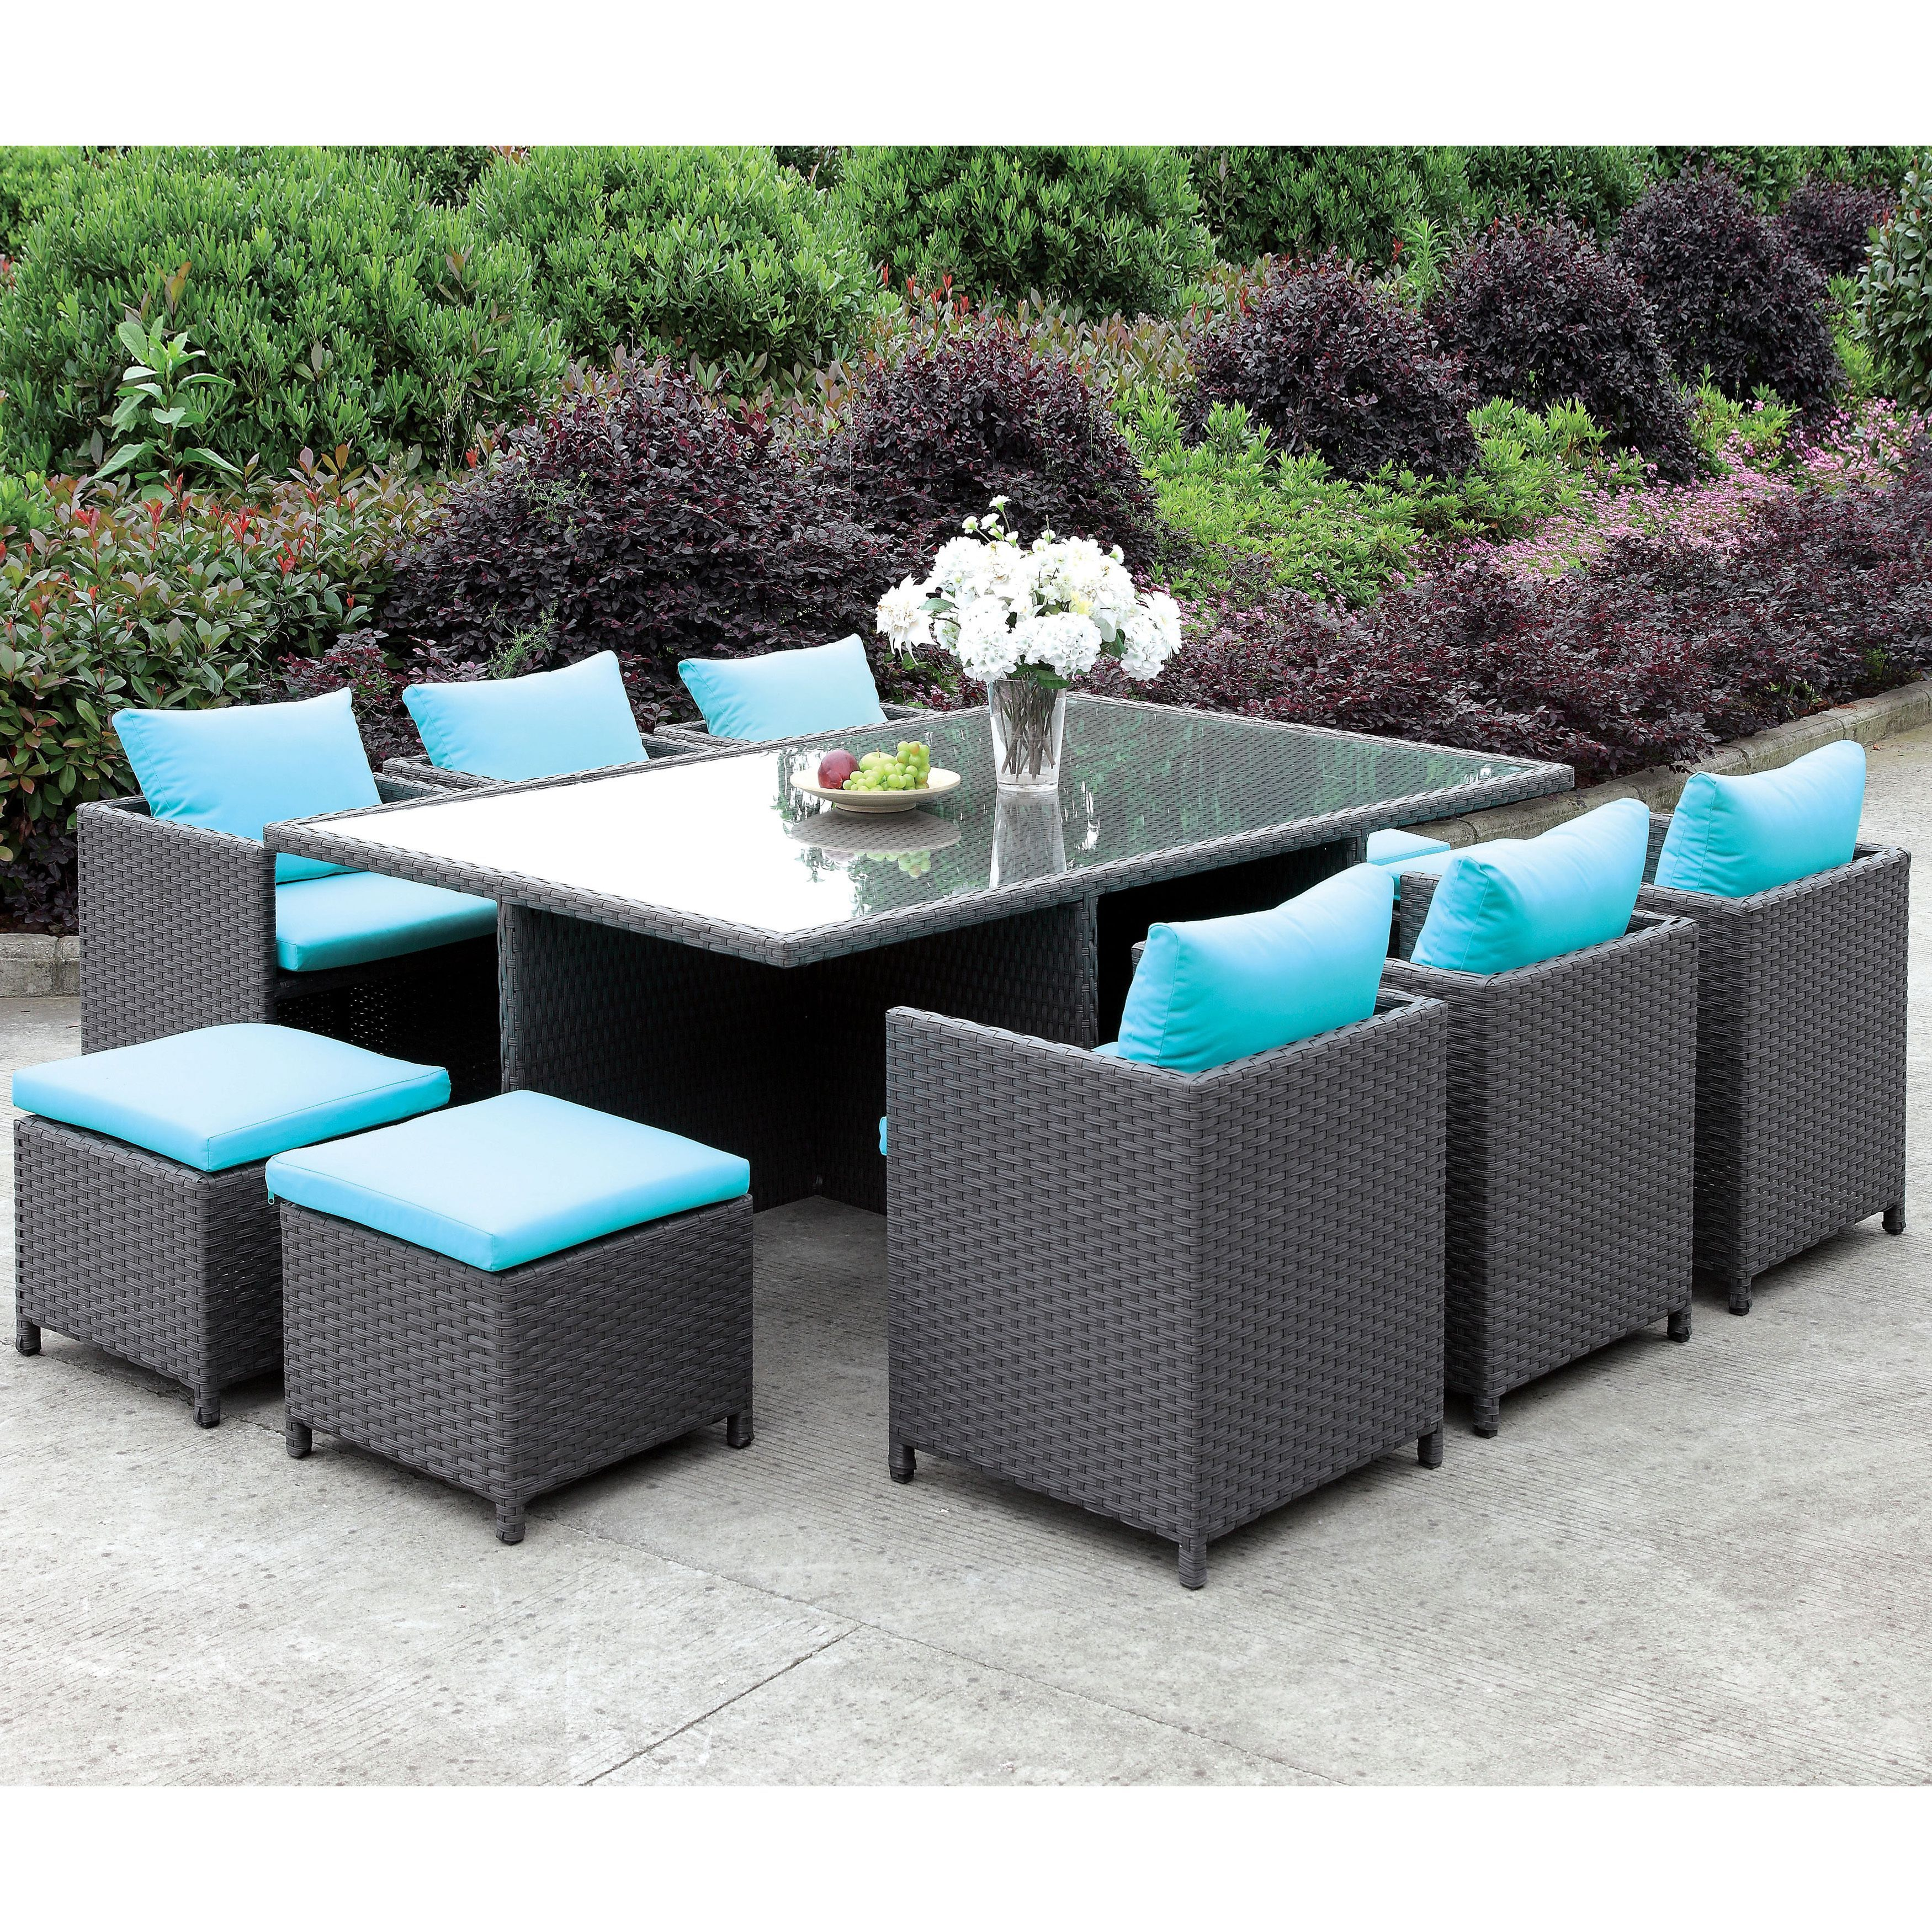 Furniture Of America Lani Contemporary 11 Piece Turquoise Light